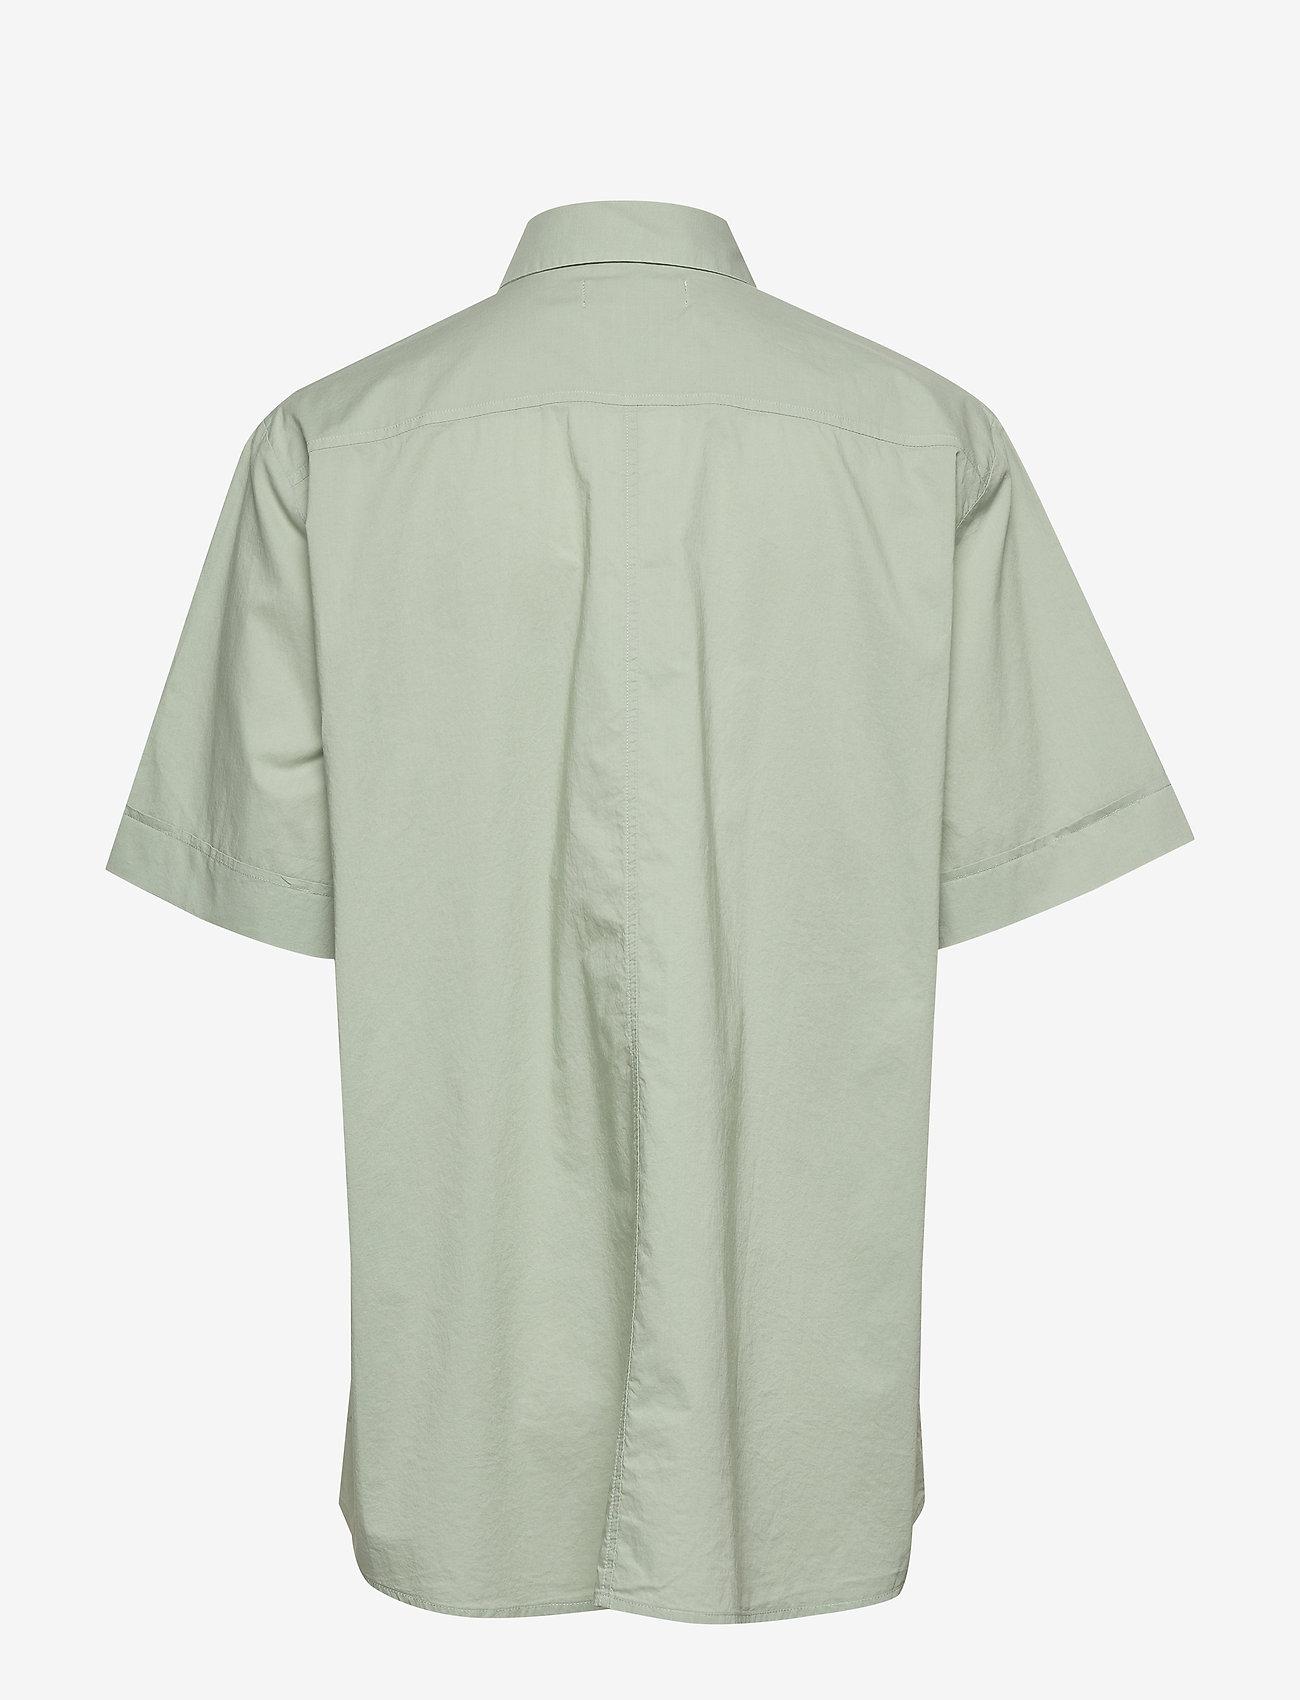 Hope - Elma Shortsleeve - koszule z krótkim rękawem - sage green - 1